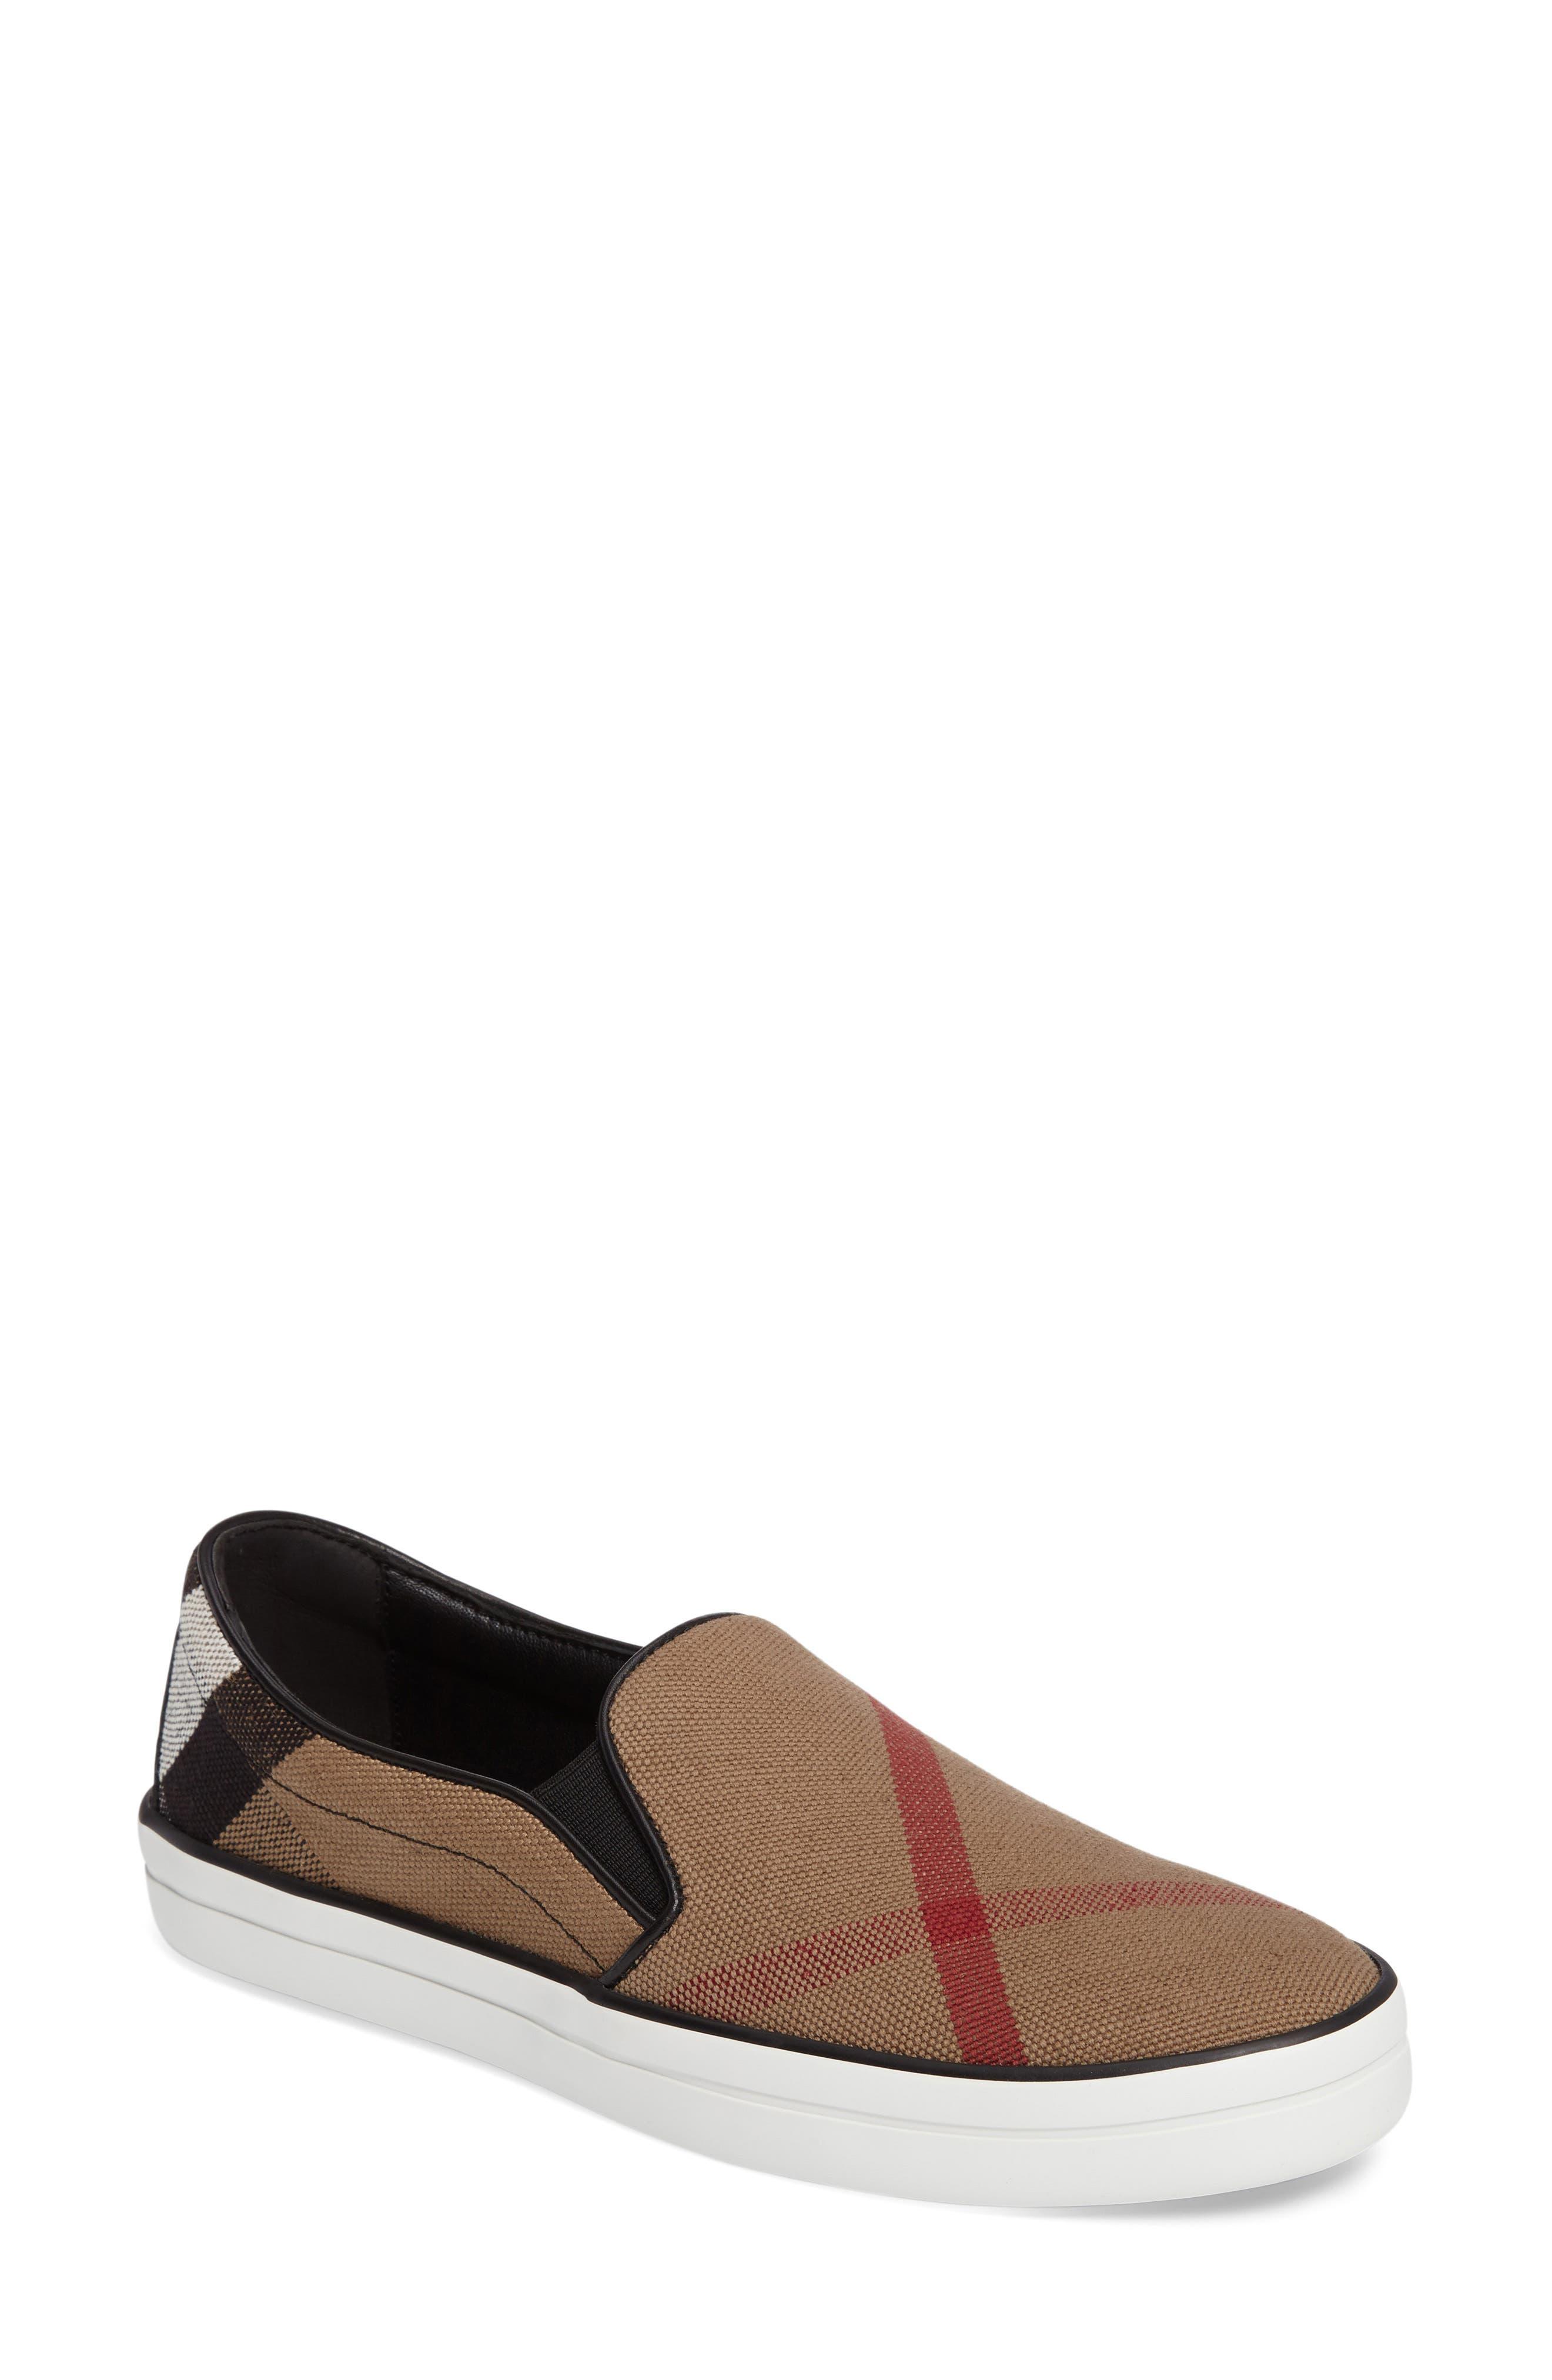 Burberry Gauden Slip-On Sneaker (Women)